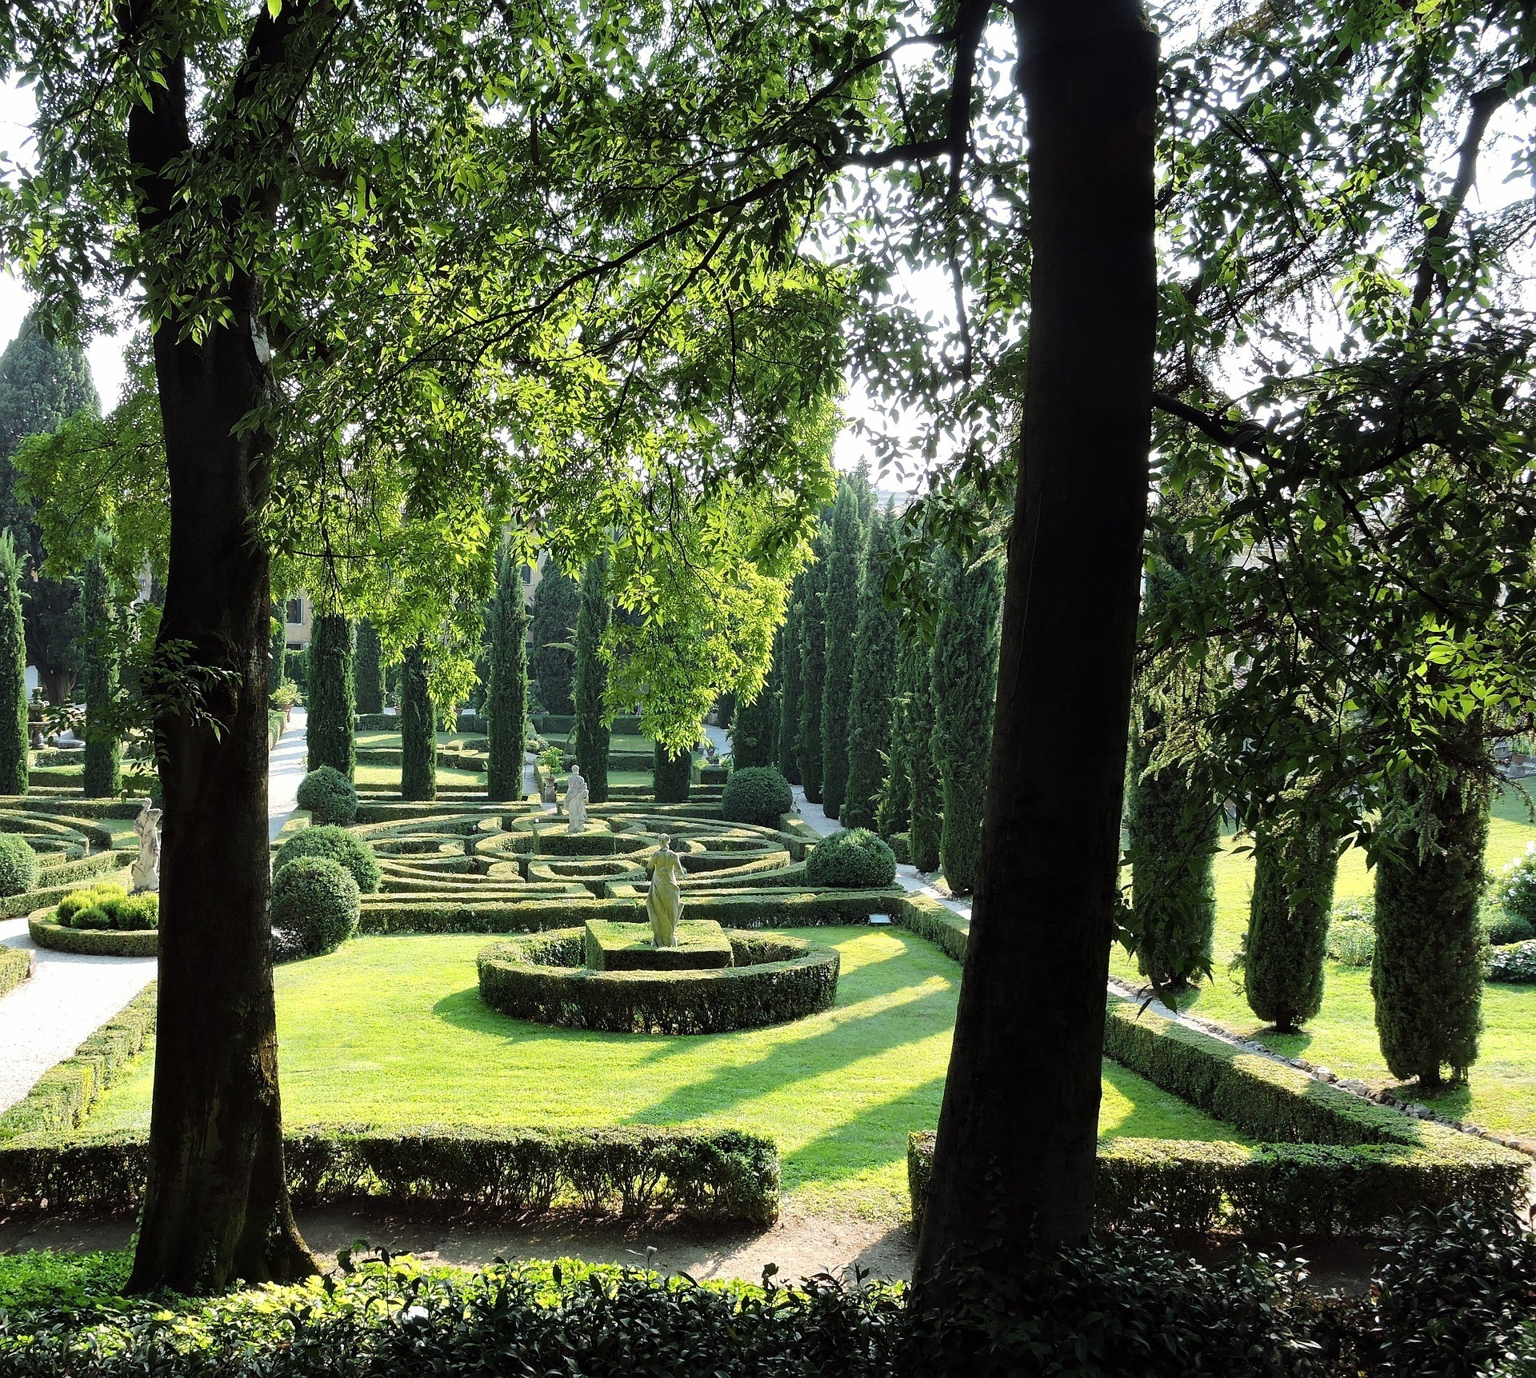 The Gardens Of Giardino Giusti in Verona